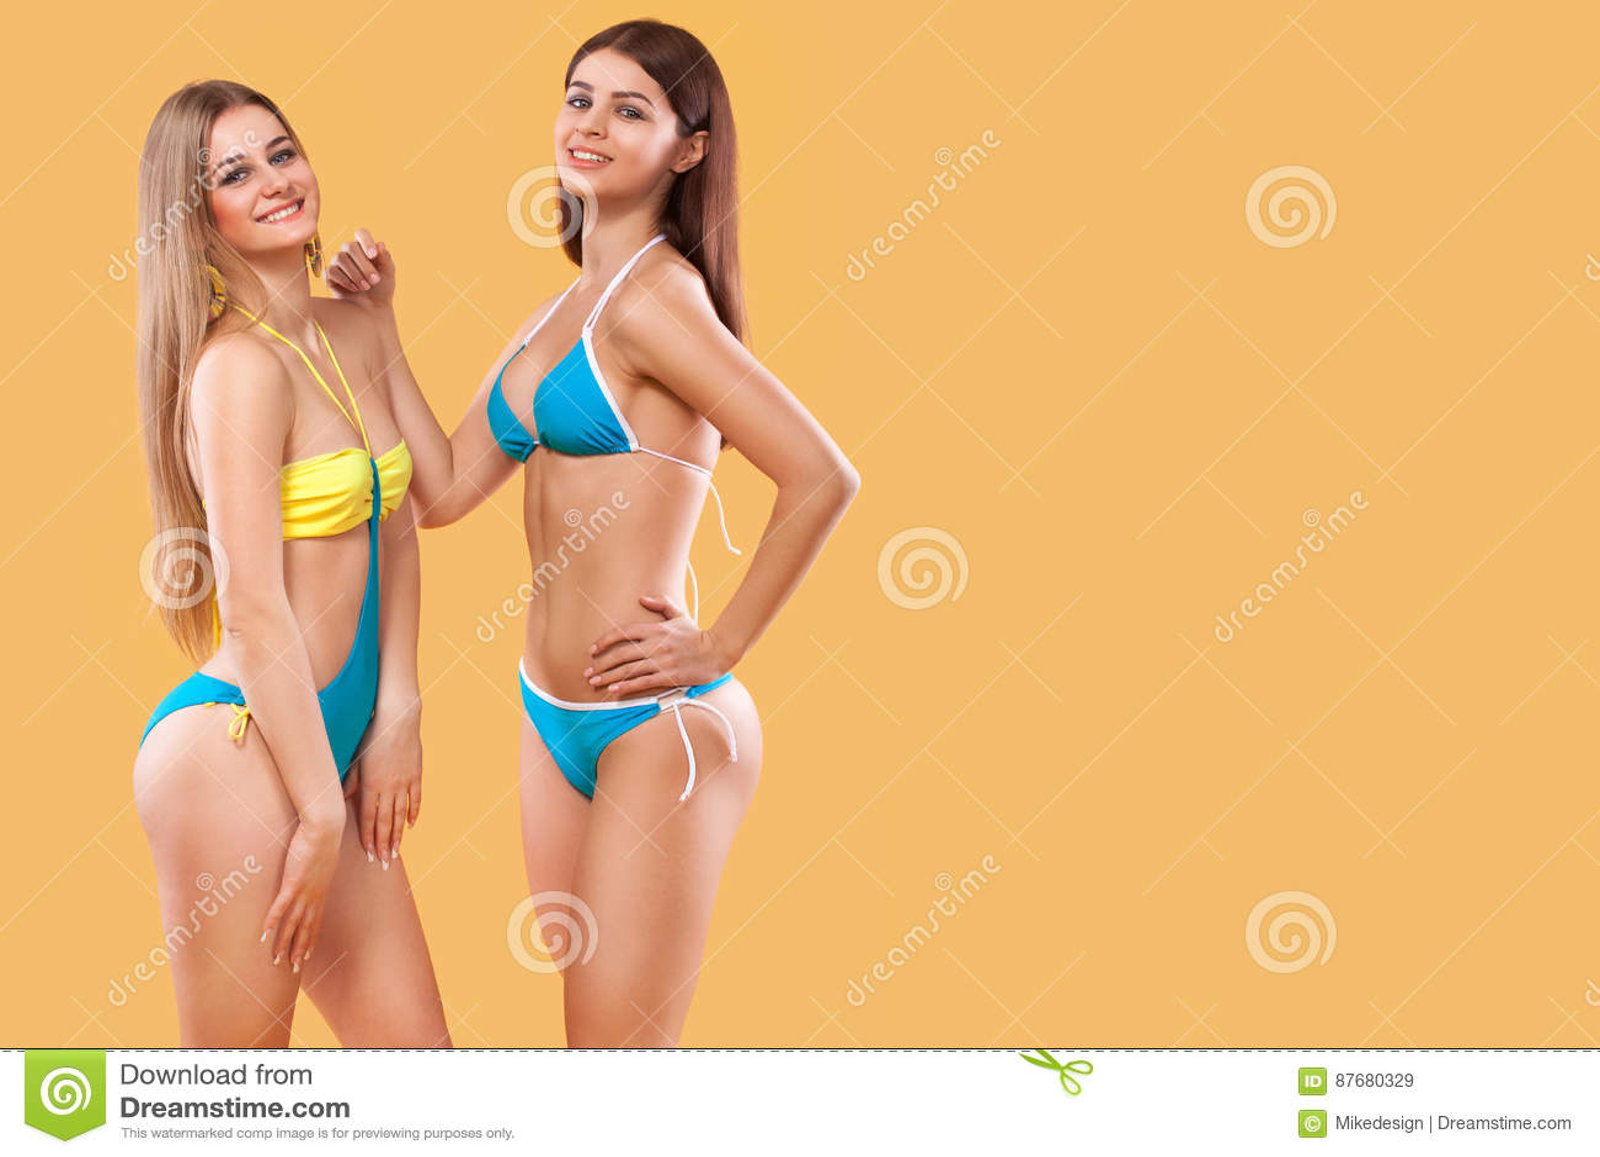 0bfc98a54dd women wearing swimsuit and posing on orange background. Perfect body. Bikini  Summer advertisement concept